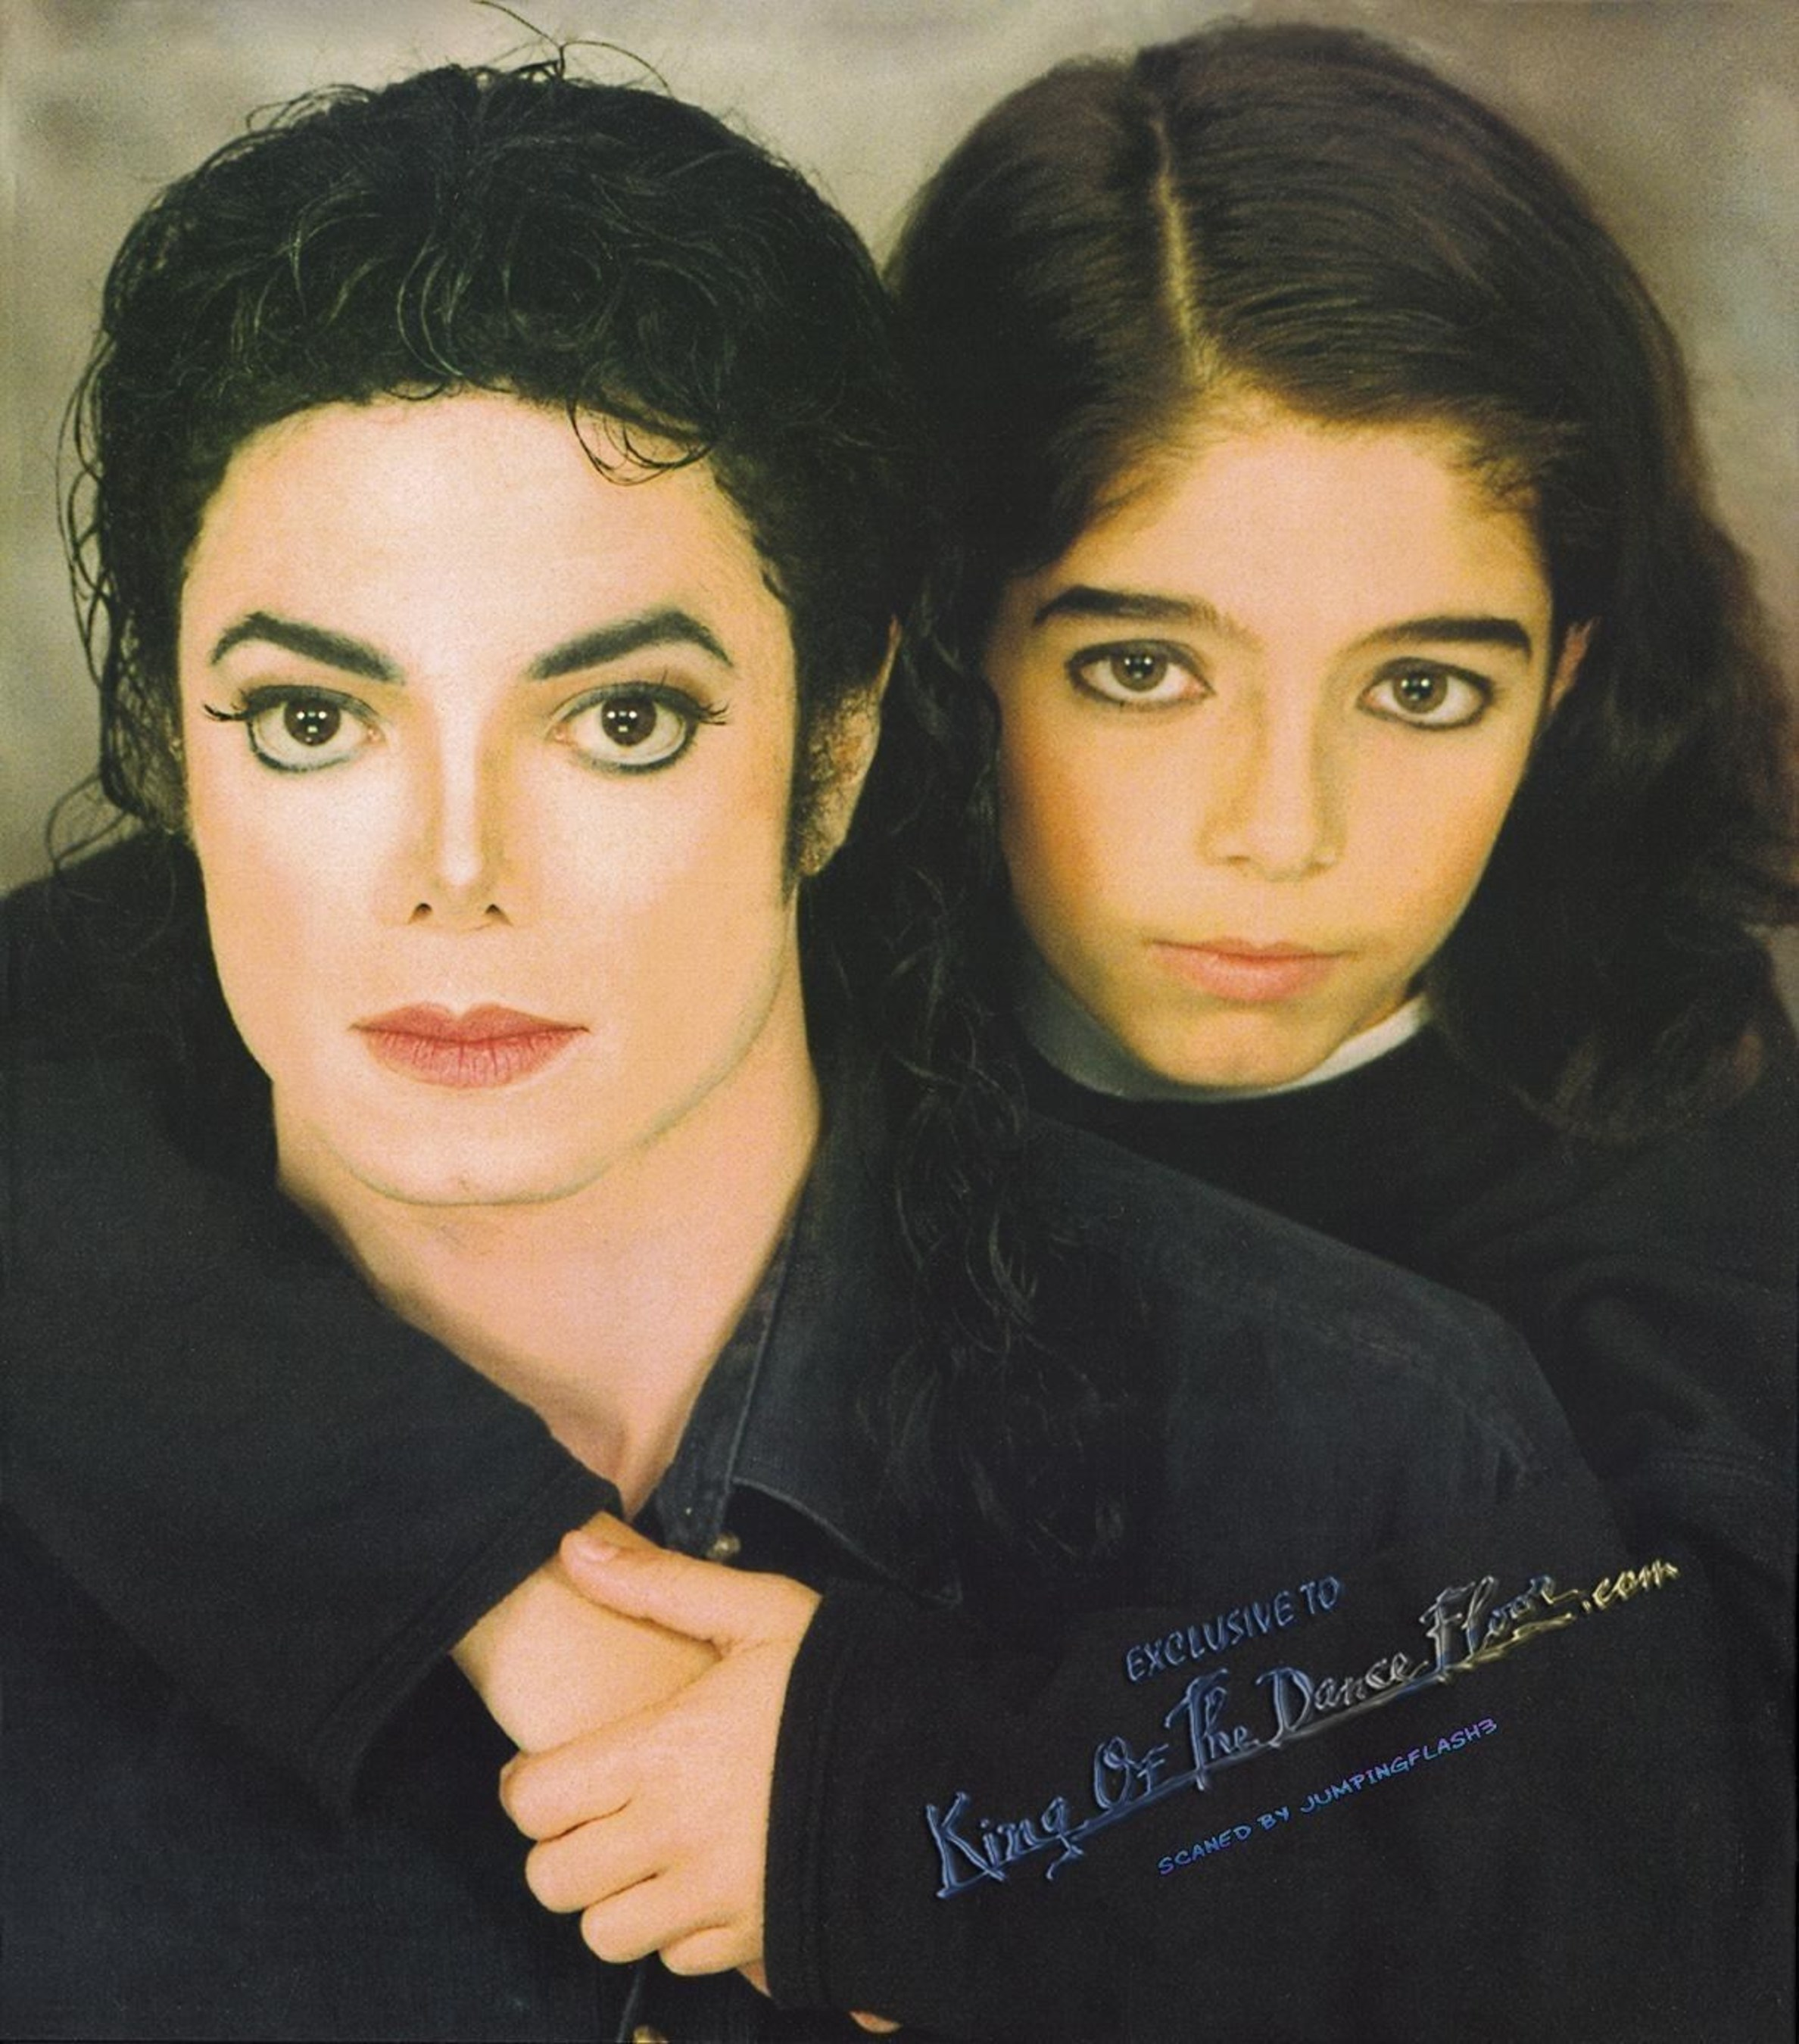 Michael Jackson and Omer Bhatti were lifelong close friends